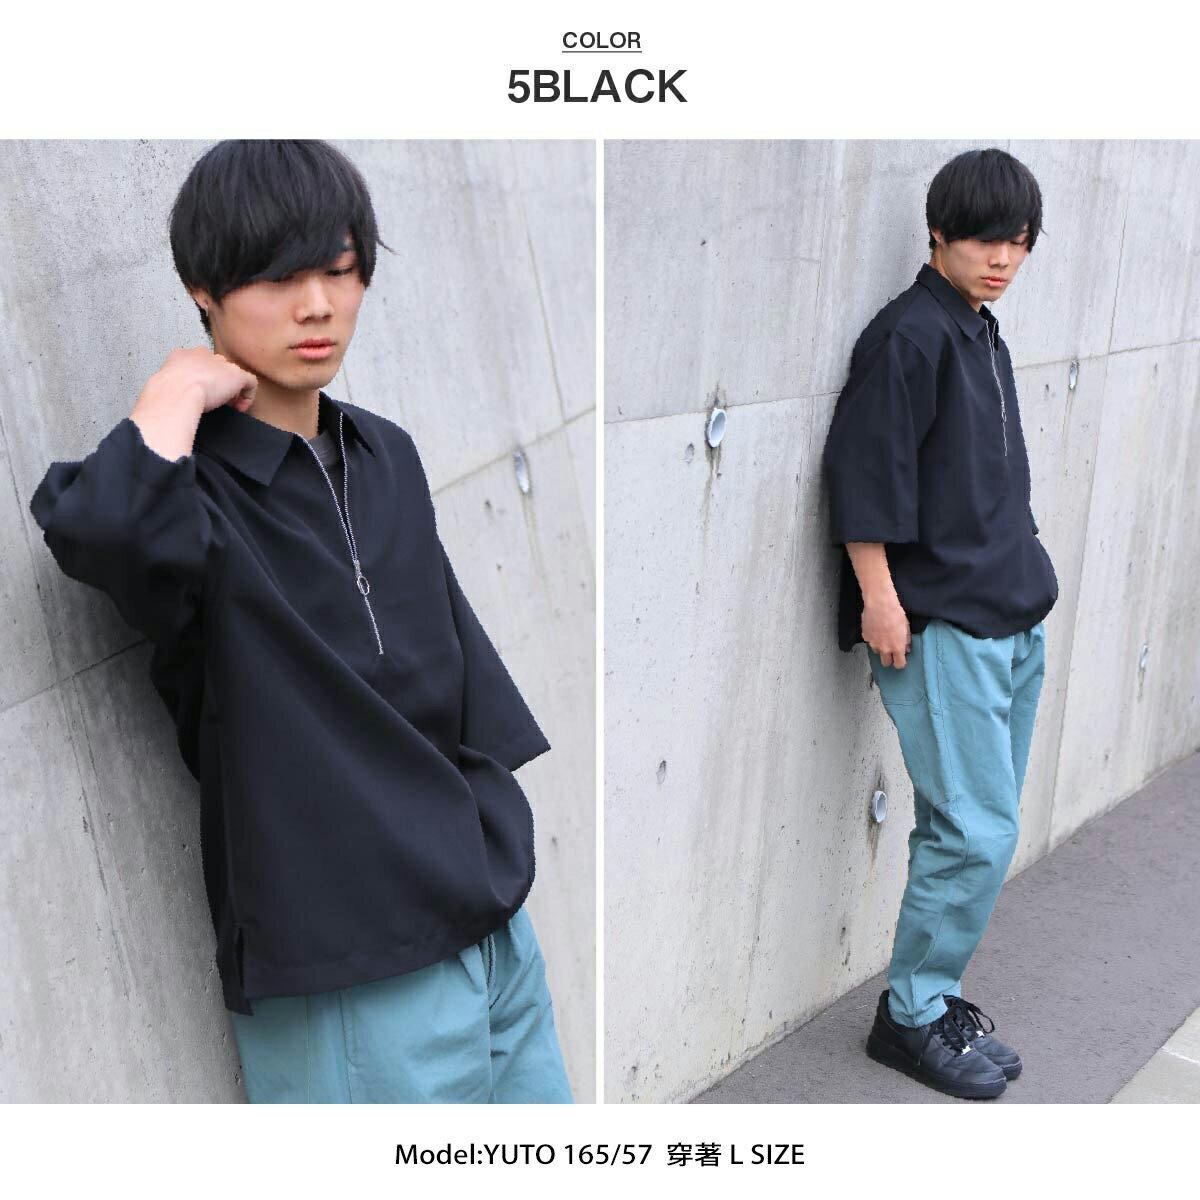 【ZIP】半拉鍊套頭衫 短袖 ZIP FIVE 襯衫 短袖 春裝 5